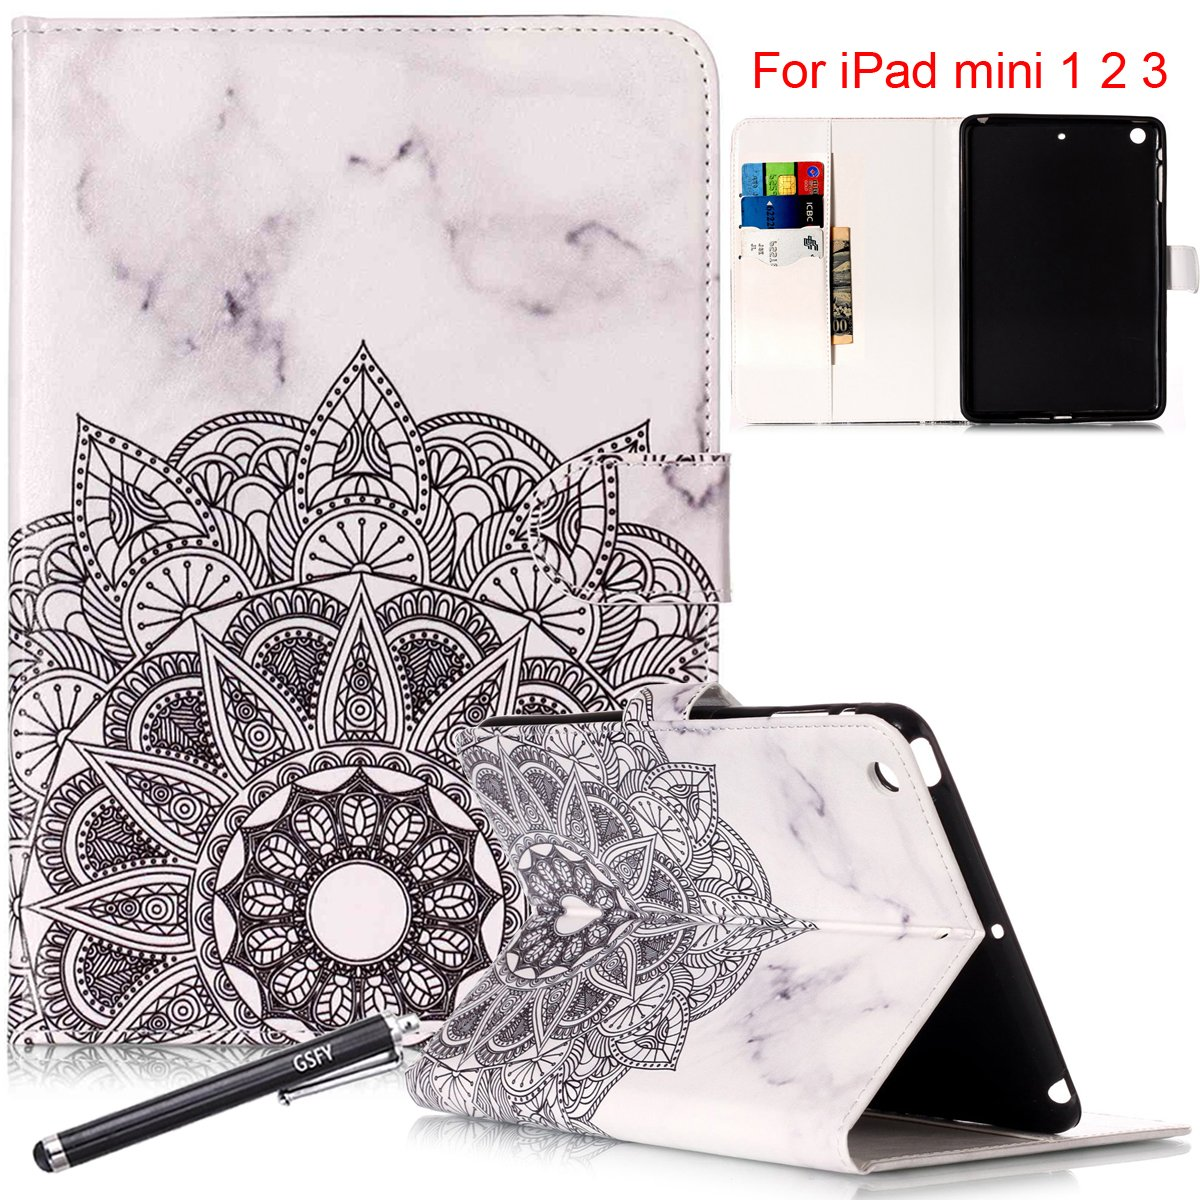 iPad MiniケースiPad mini 1 / 2 / 3ケース, Newshine [パーフェクトフィット] PUレザー磁気フリップ財布SmartShell [スタンド機能]ケースカバー[自動スリープ/スリープ解除機能]付きApple iPad Mini 3 / 2 / 1  02 Marble&Flower B076CFJ8LG